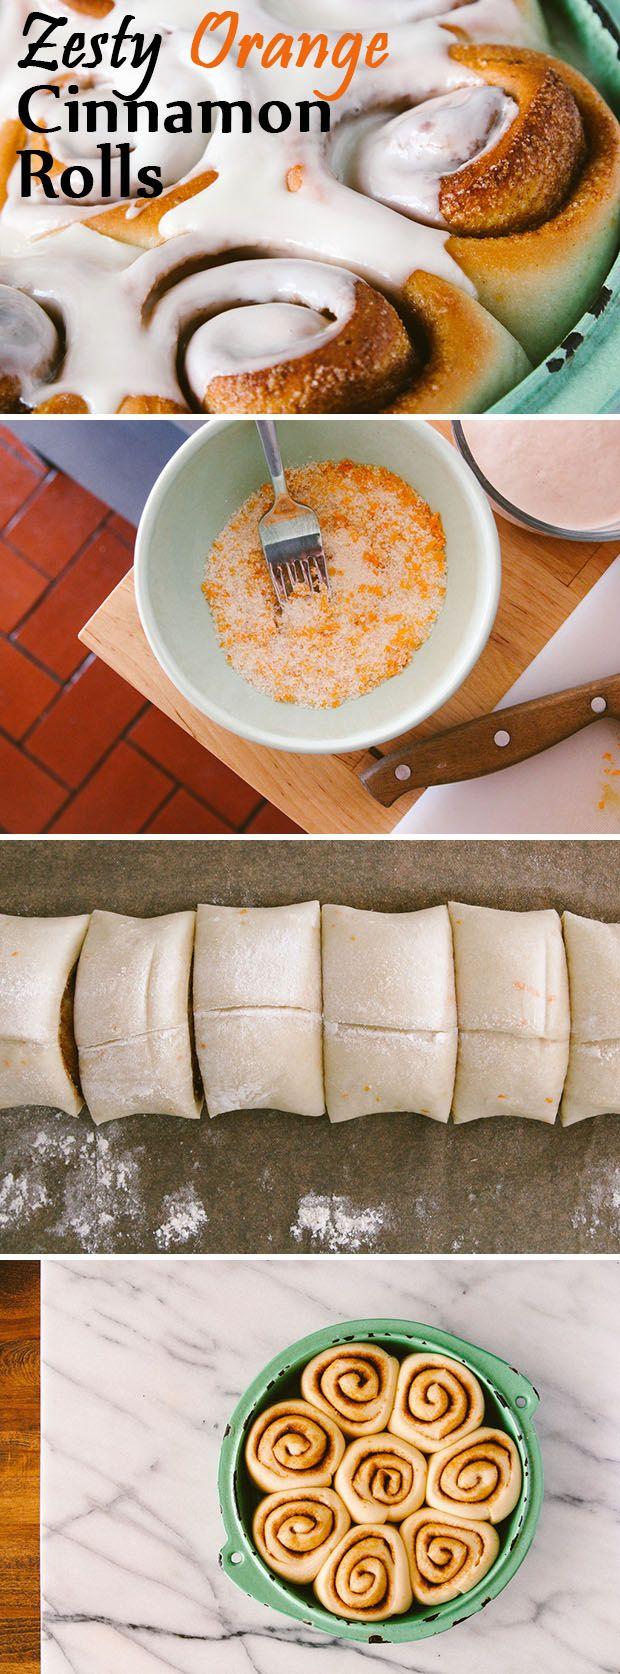 Zest-up your breakfast with these zesty orange cinnamon rolls. YUM.